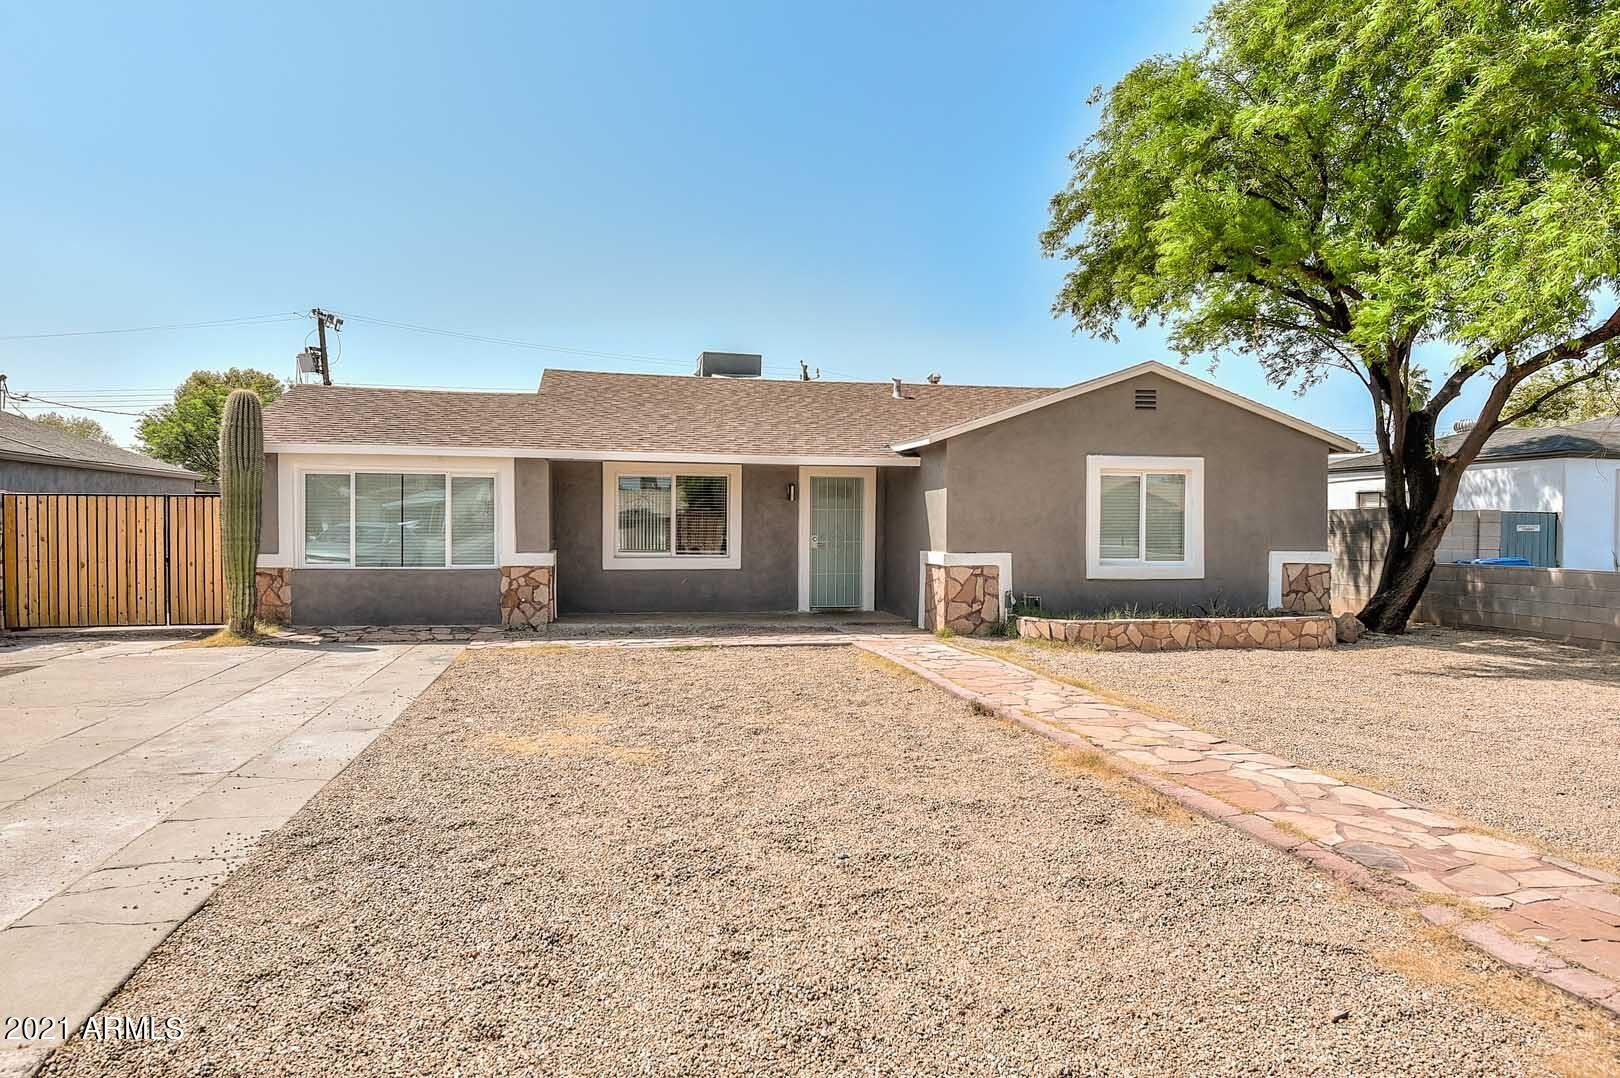 4318 N 15TH Avenue, Phoenix, AZ 85015 - MLS#: 6284462